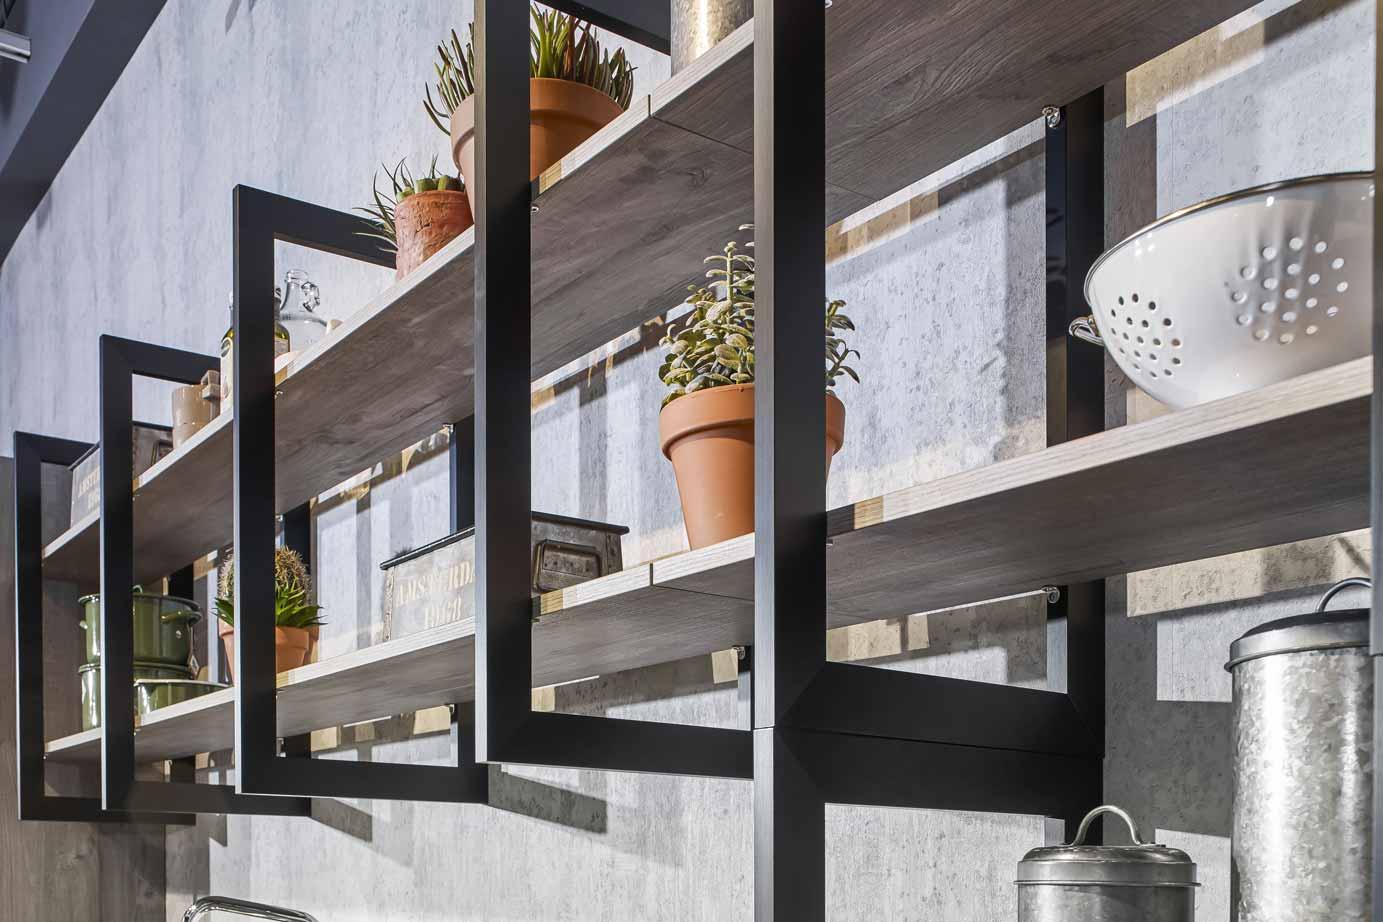 Keuken Industriele Design : Industriële keuken grove robuuste en stoere materialen db keukens